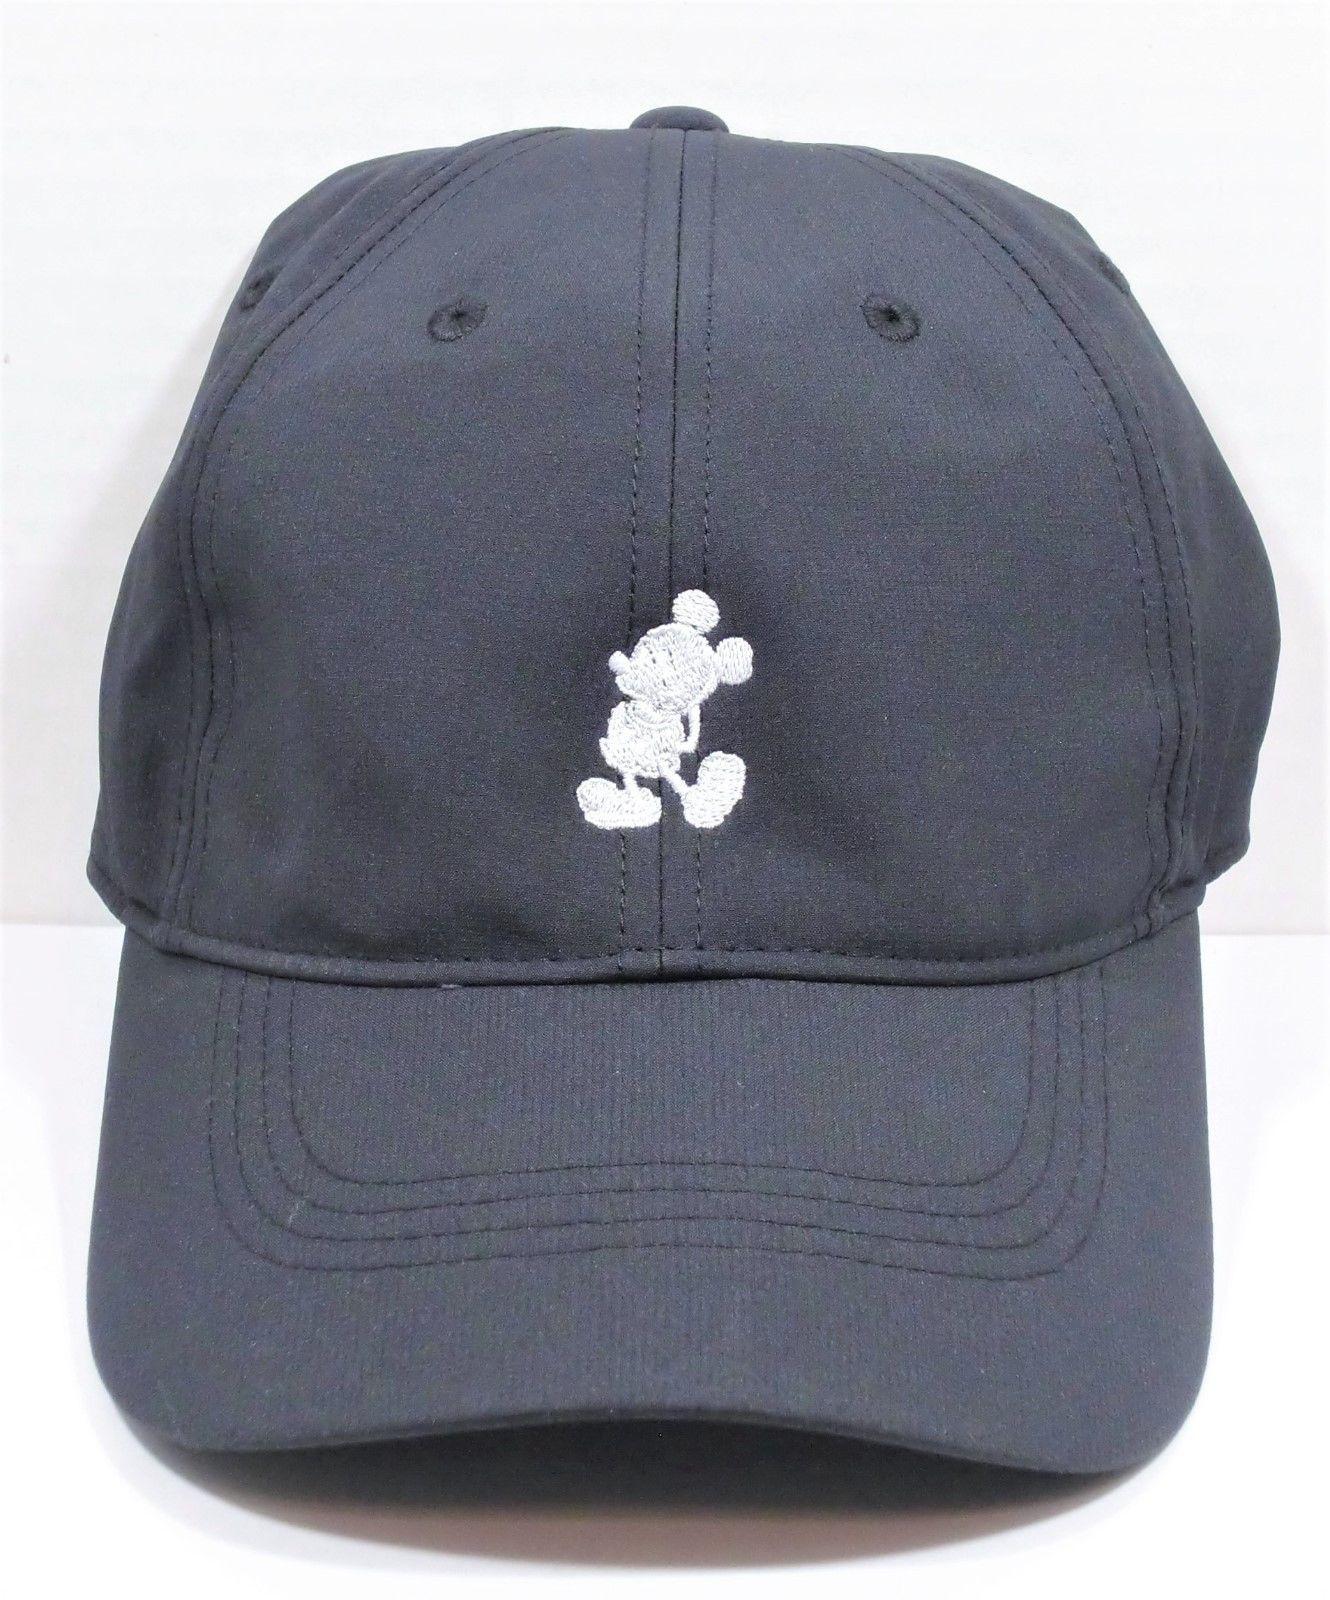 e60b034f09a0e Disney Parks Exclusive Mickey Mouse Black Nike Dri Fit Baseball Golf Cap  Hat NEW